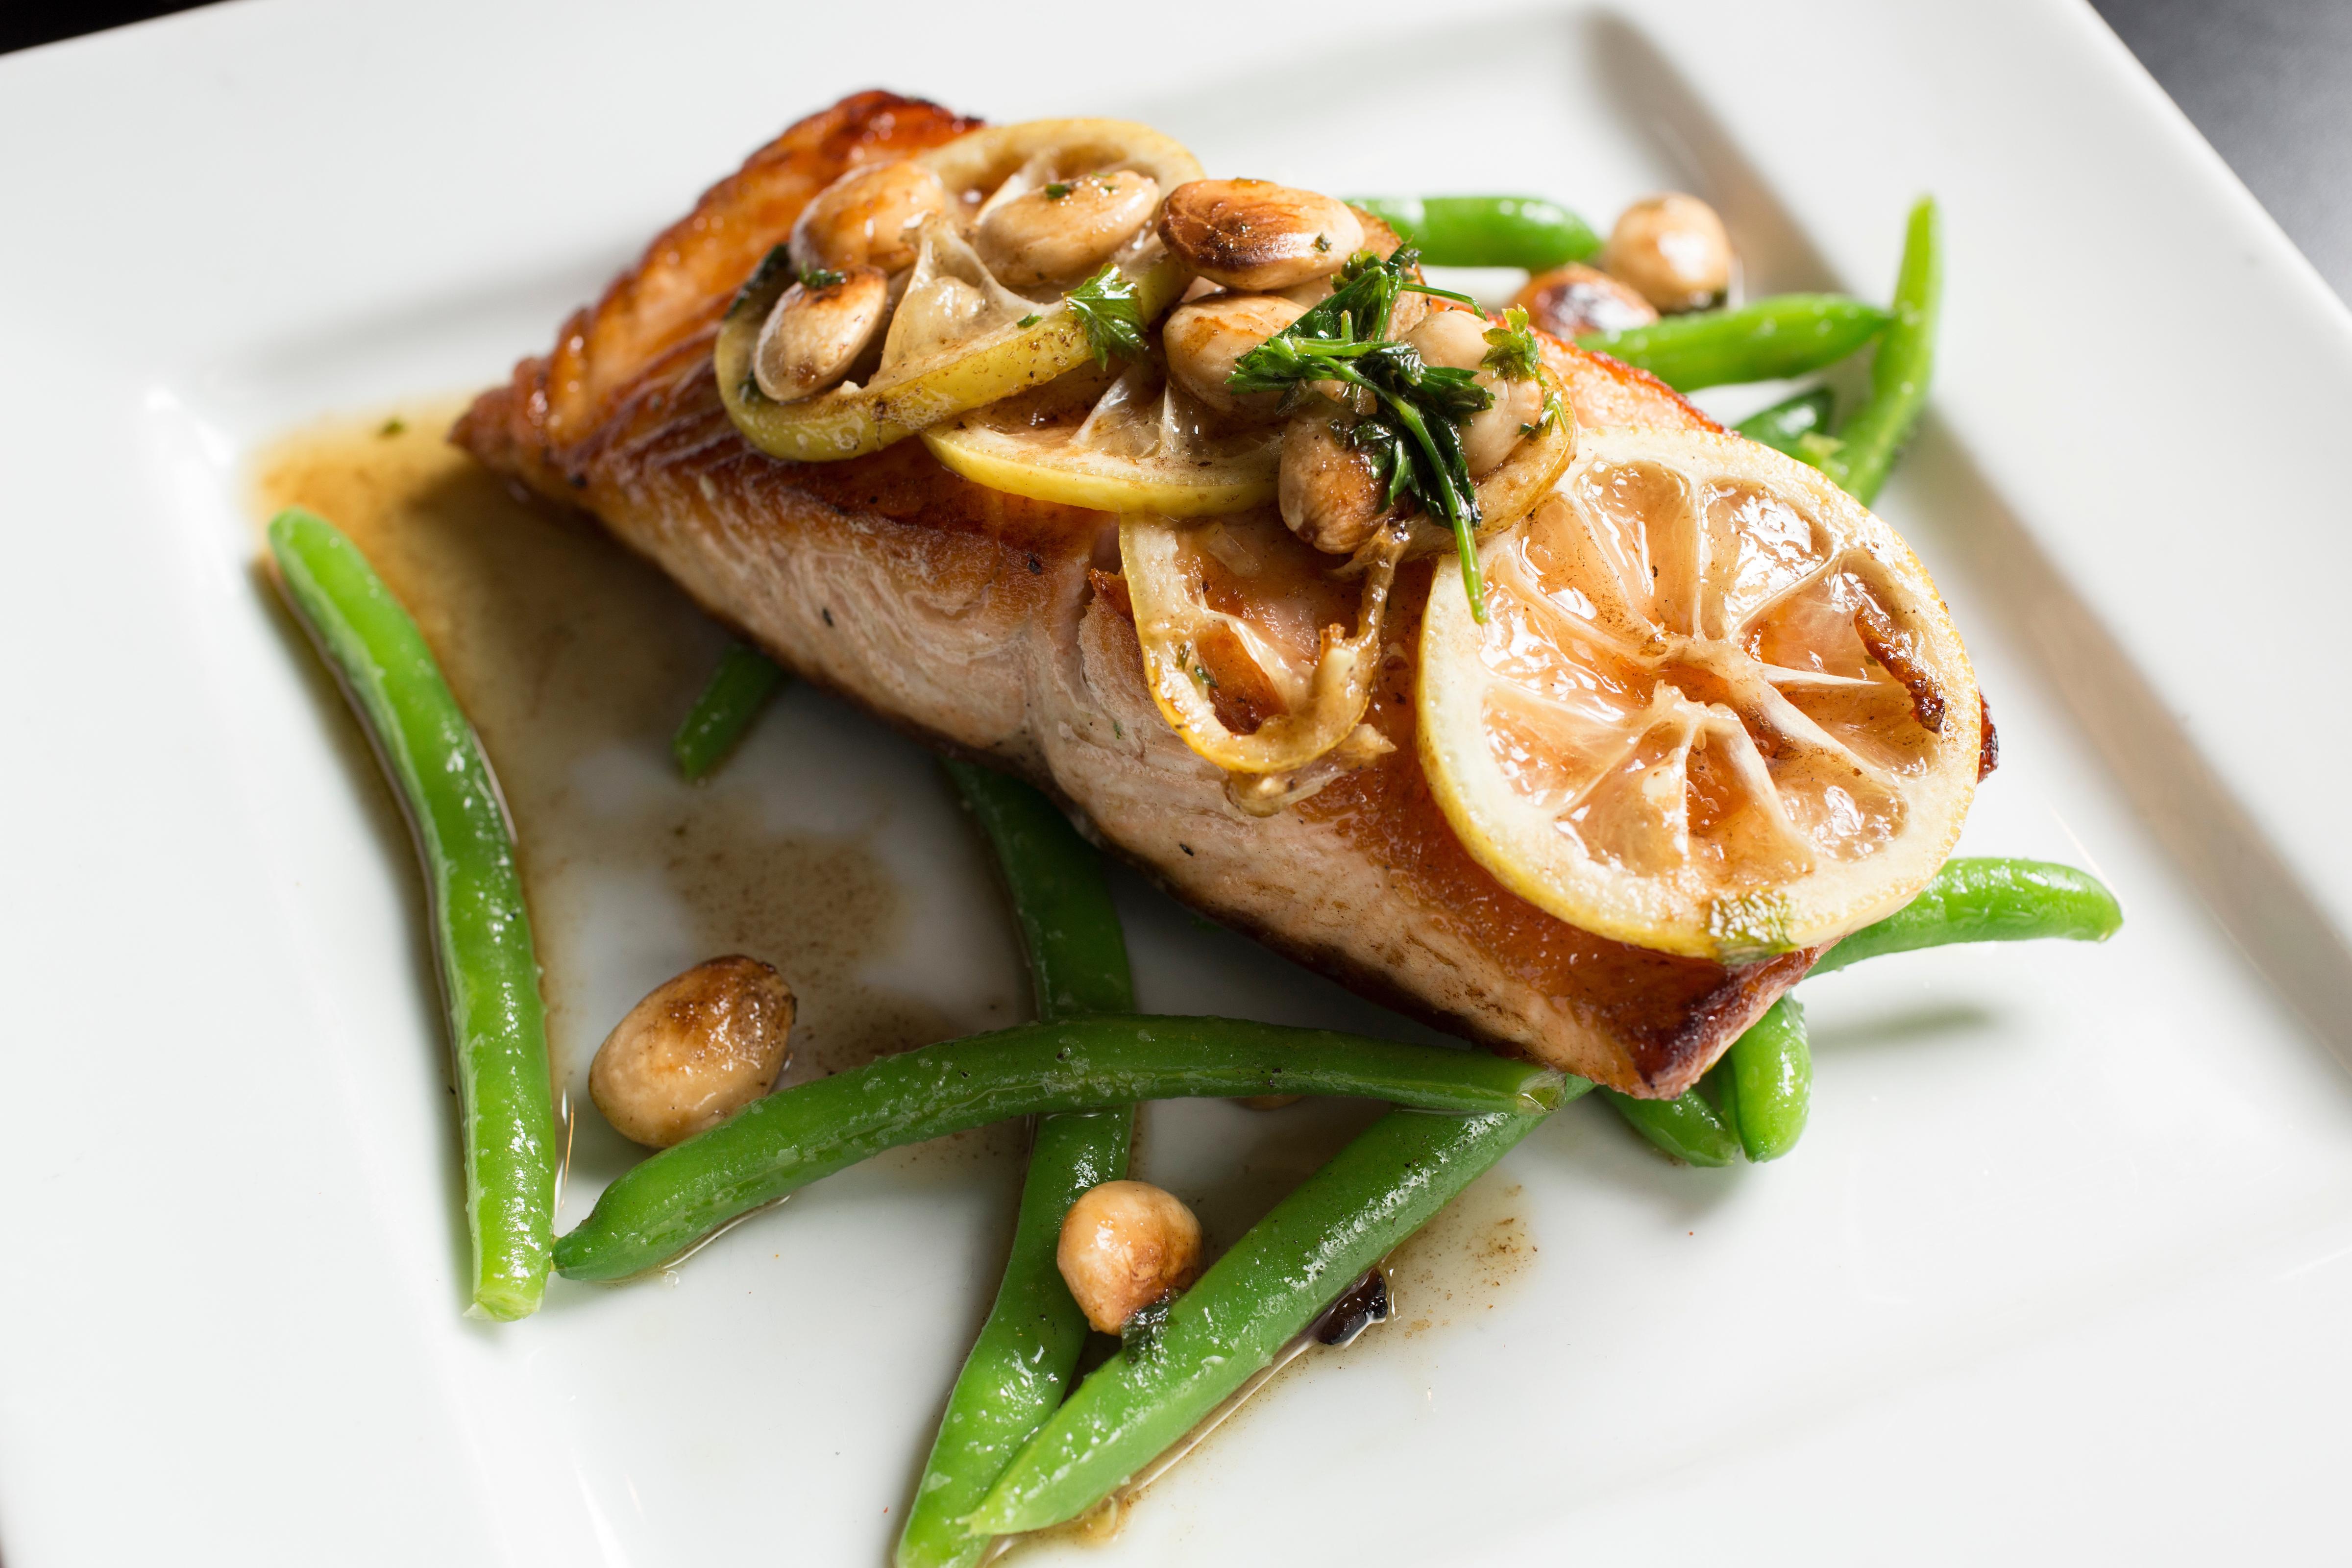 Dine originals restaurant week menu sept 2016 the top for 010 cuisine weekmenu